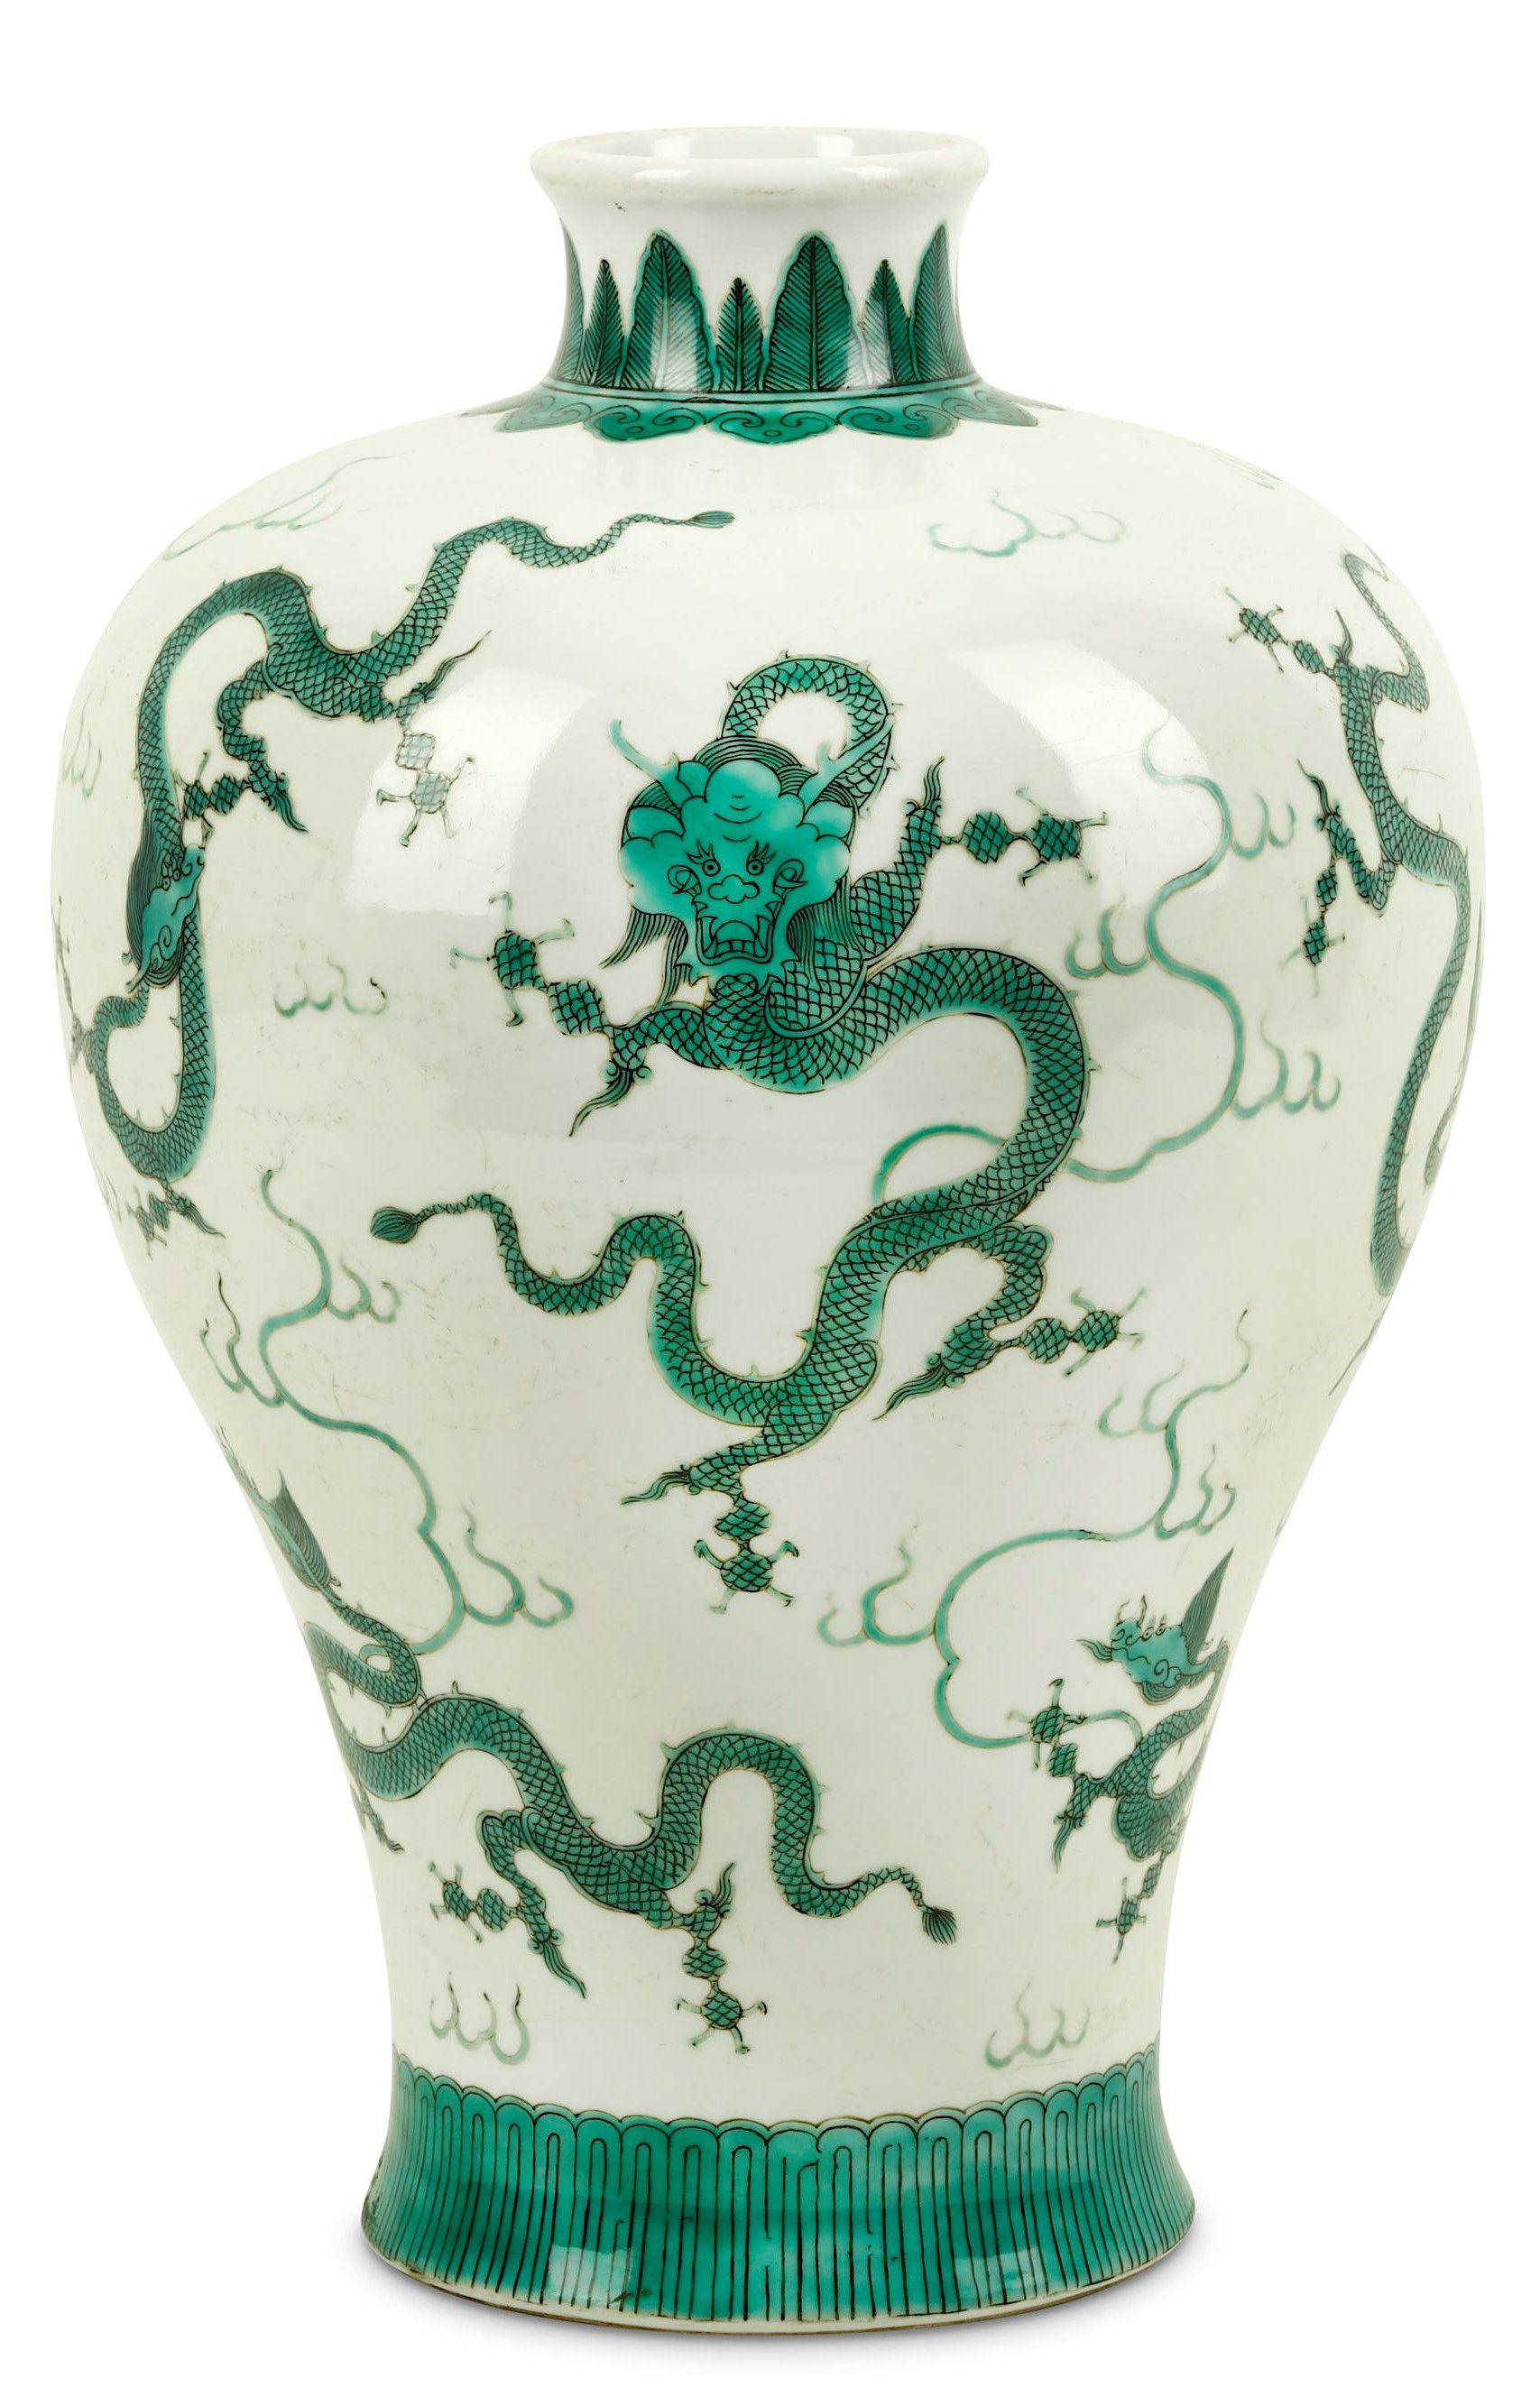 Enamelled Dragon Meiping Vase | China | #dragon #dragons #art #antique #ceramic #ware #Jingdezhen #stoneware #porcelain #pottery #auction #history #poterie #céramique #sculpture #celadon #antiquité #brocante #stoneware #museum #sancai #nankin #dynasty #tang #ming #song #tong #yuan #Qianlong #qing #Cizhou #meiping #imperial #period #chine #drachen #drache #drago #Japan #meiji #satsuma #Shenlong #Tianlong #Qiulong #Panlong #longshan #ryū #龍 #竜 #龙